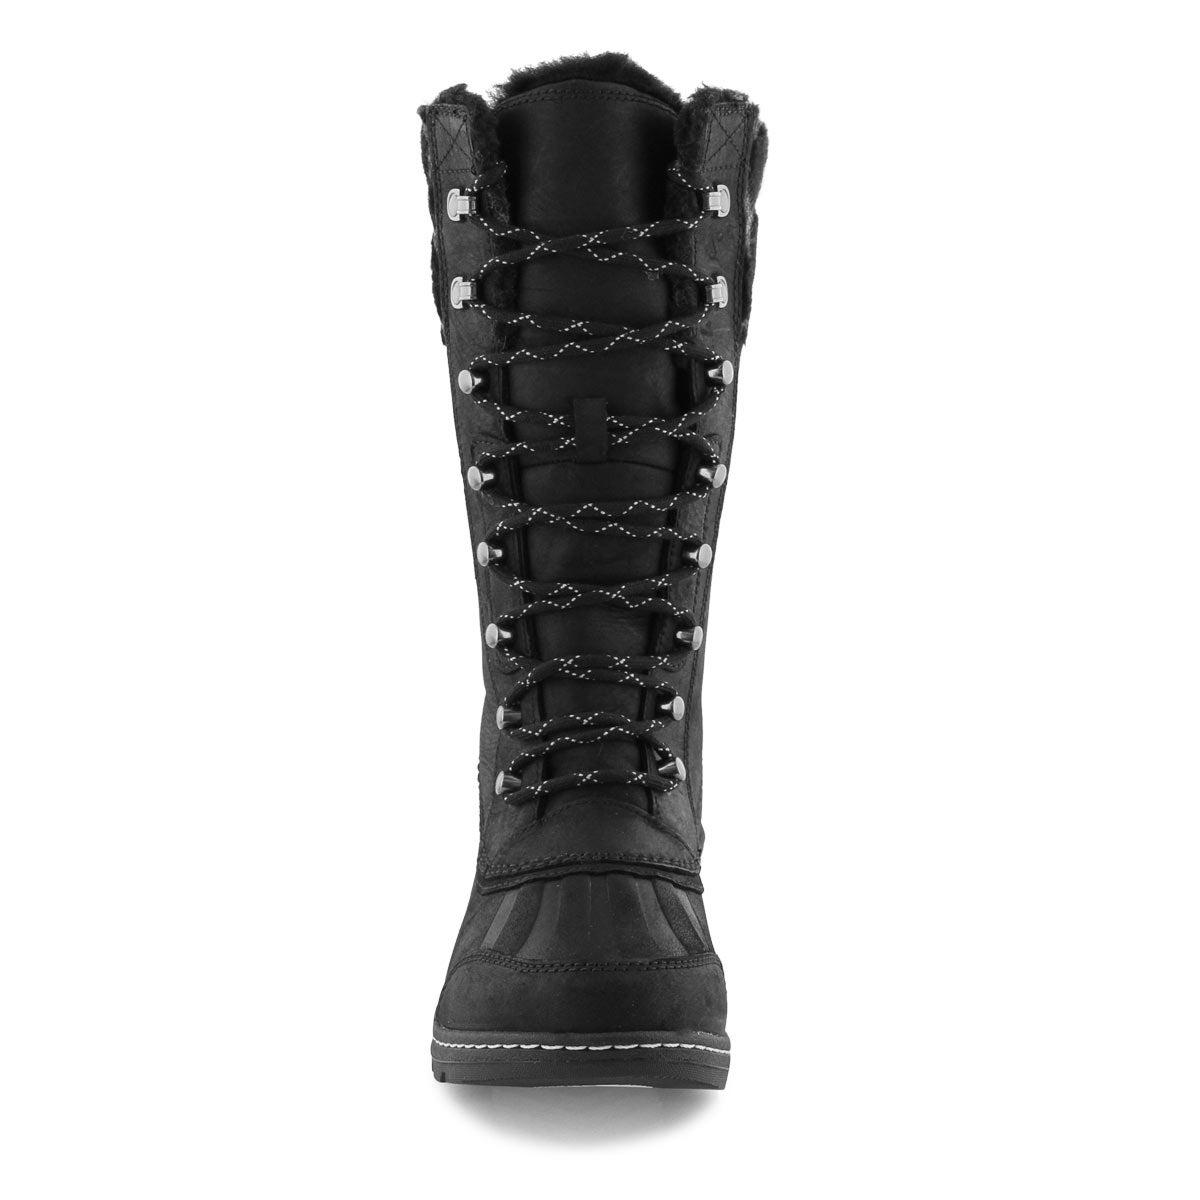 Lds Whistler Tall black wtpf winter boot